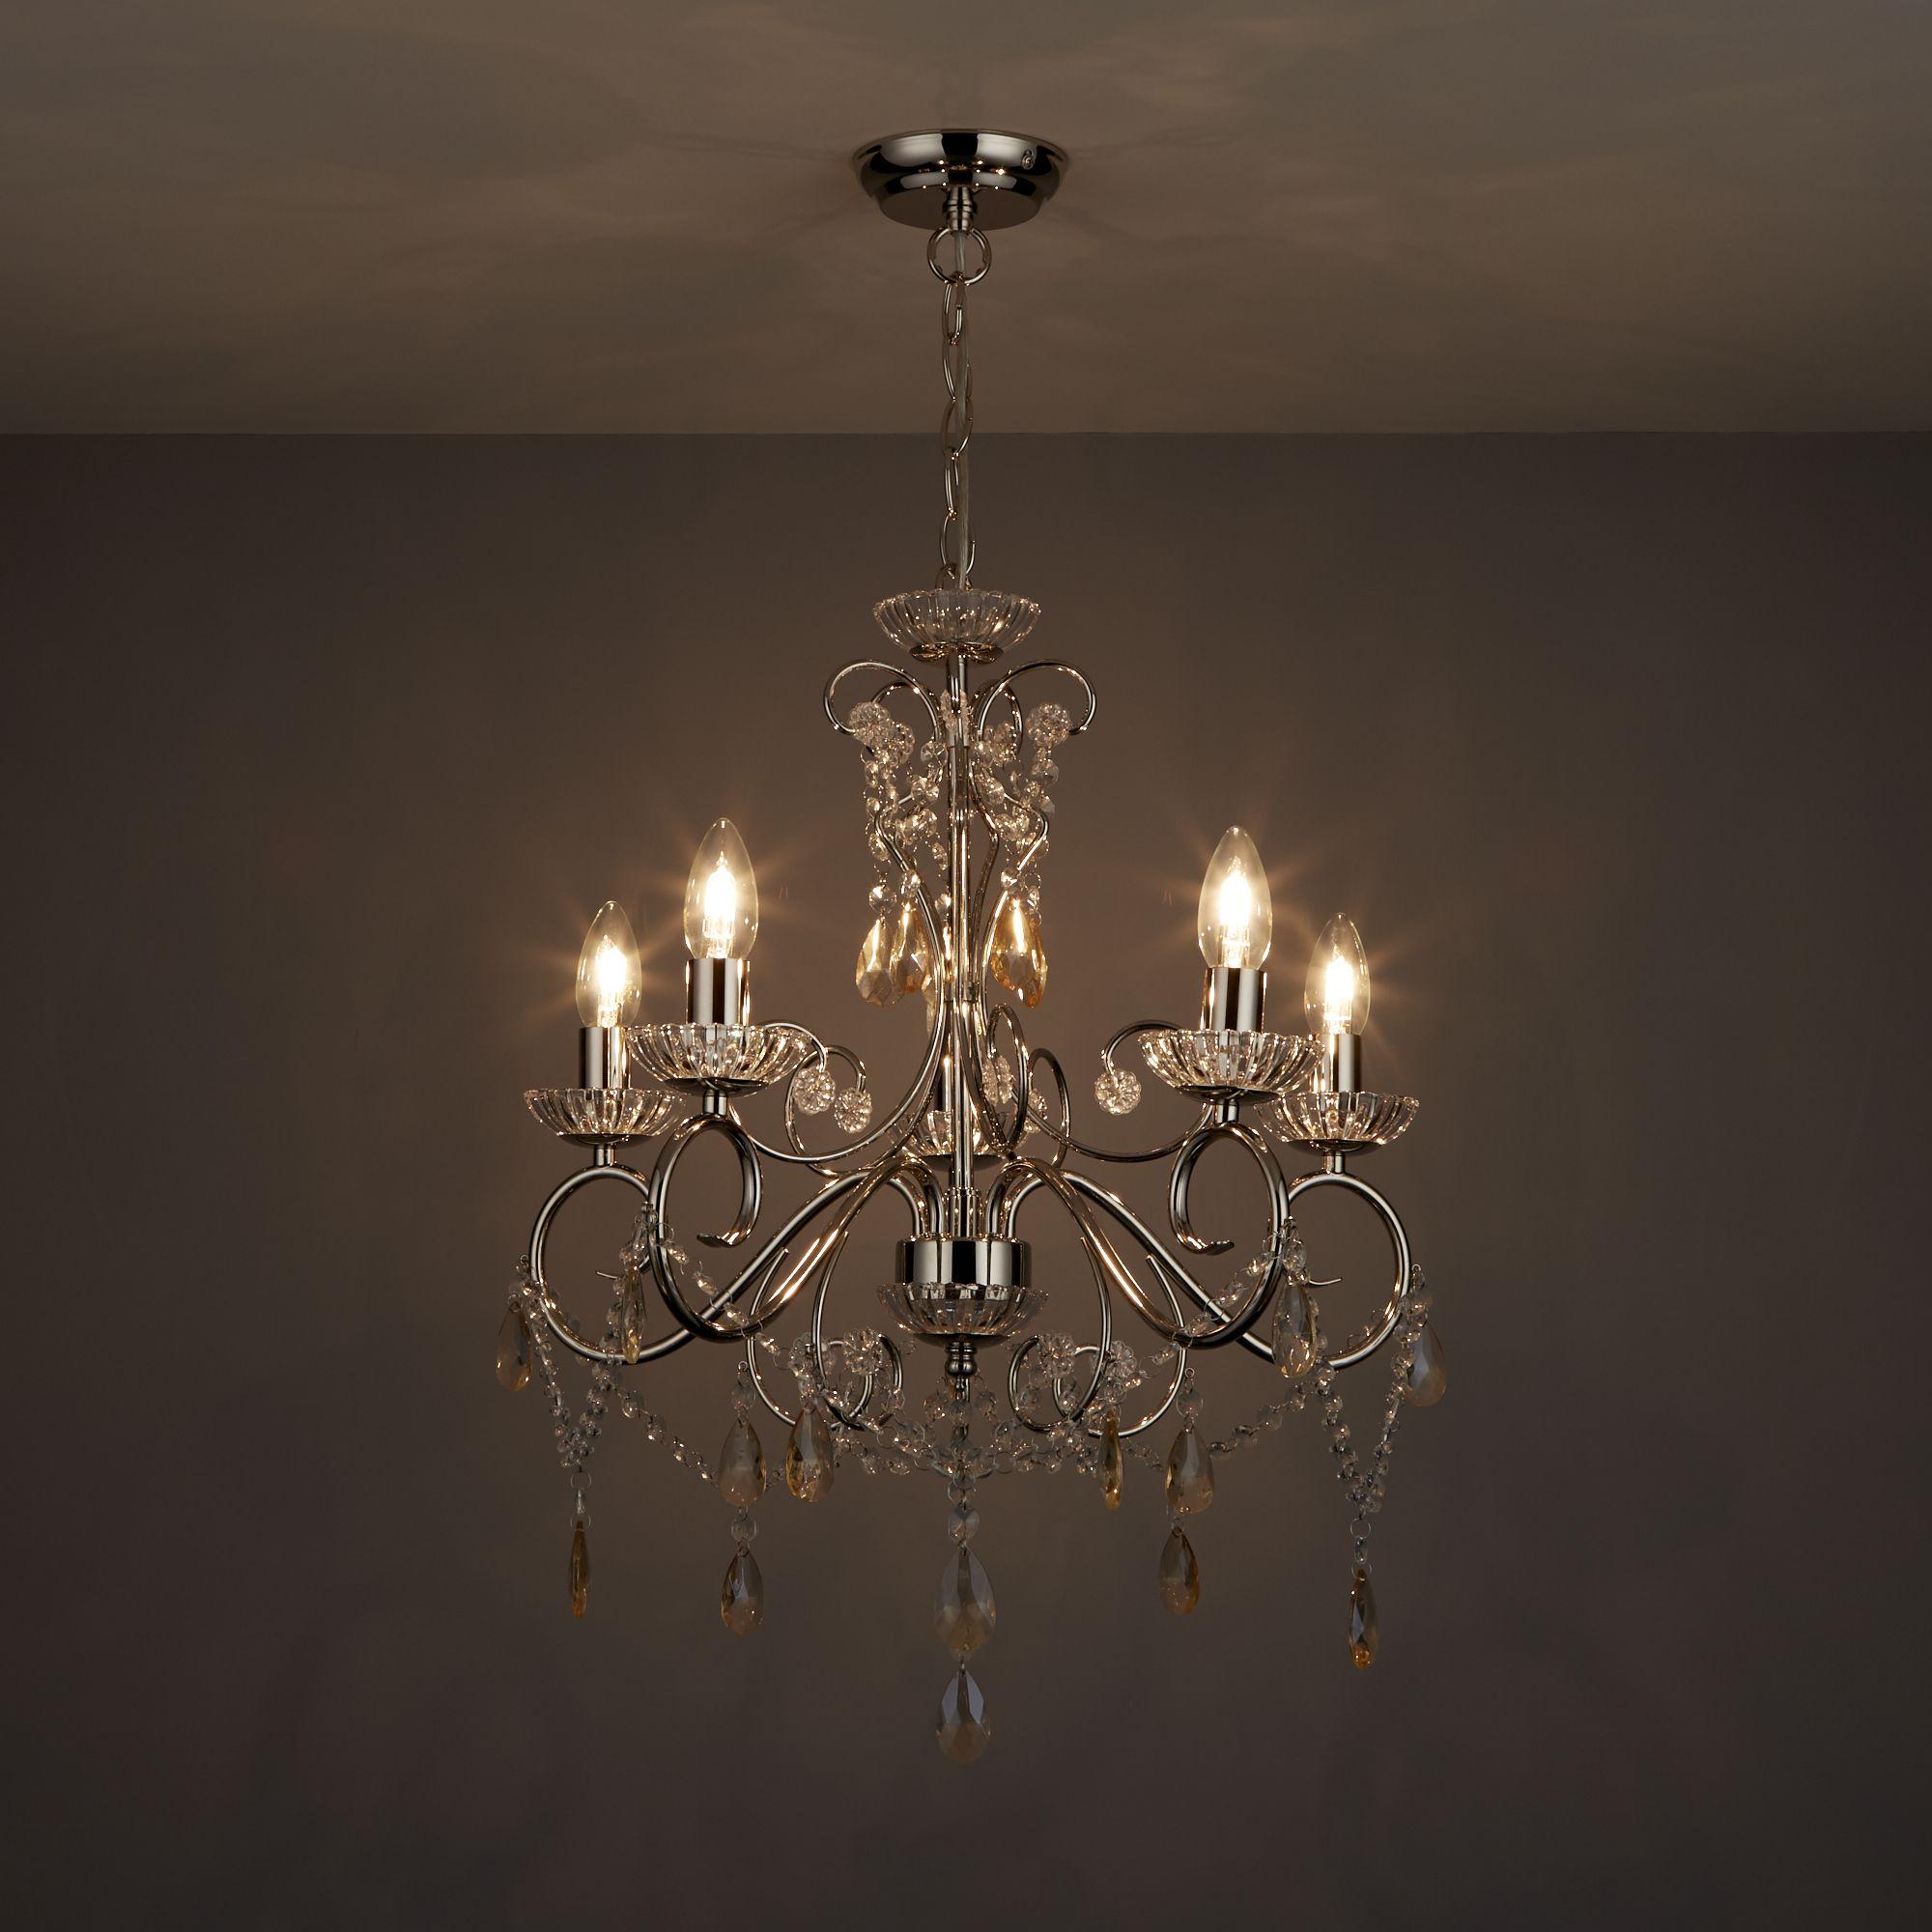 Chandelier Lighting B Q: Chesworth Nickel Effect 5 Lamp Pendant Ceiling Light